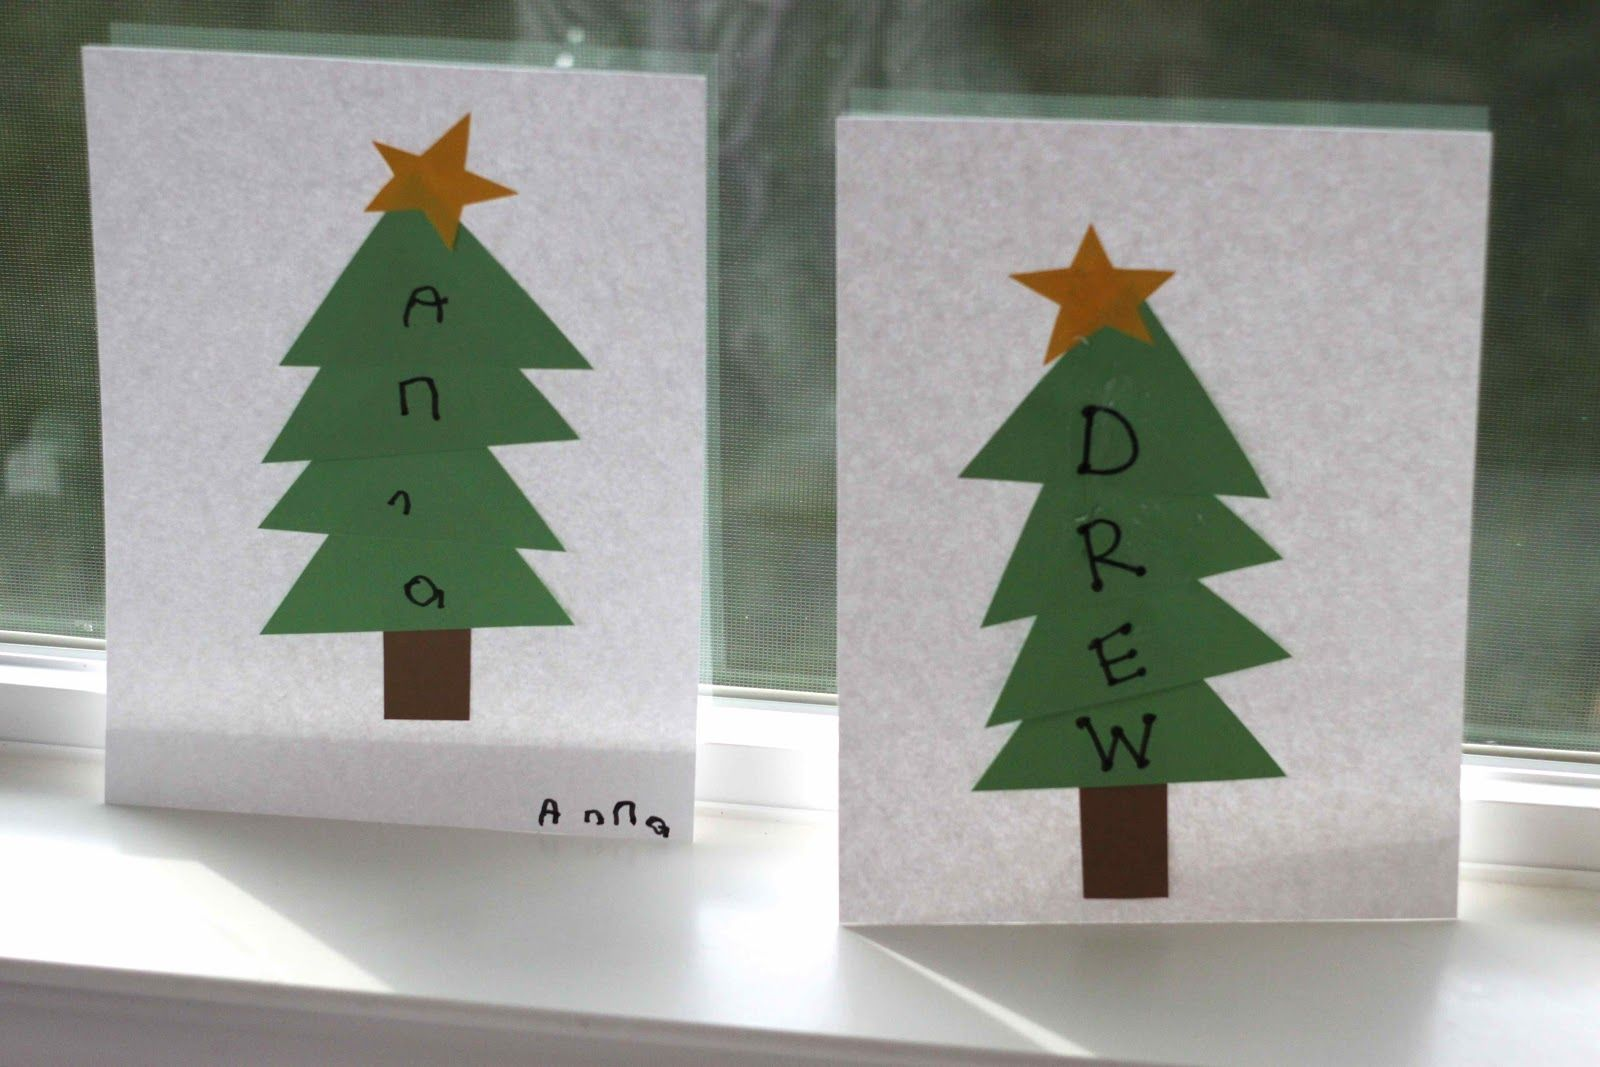 Spelling Name Winter Trees